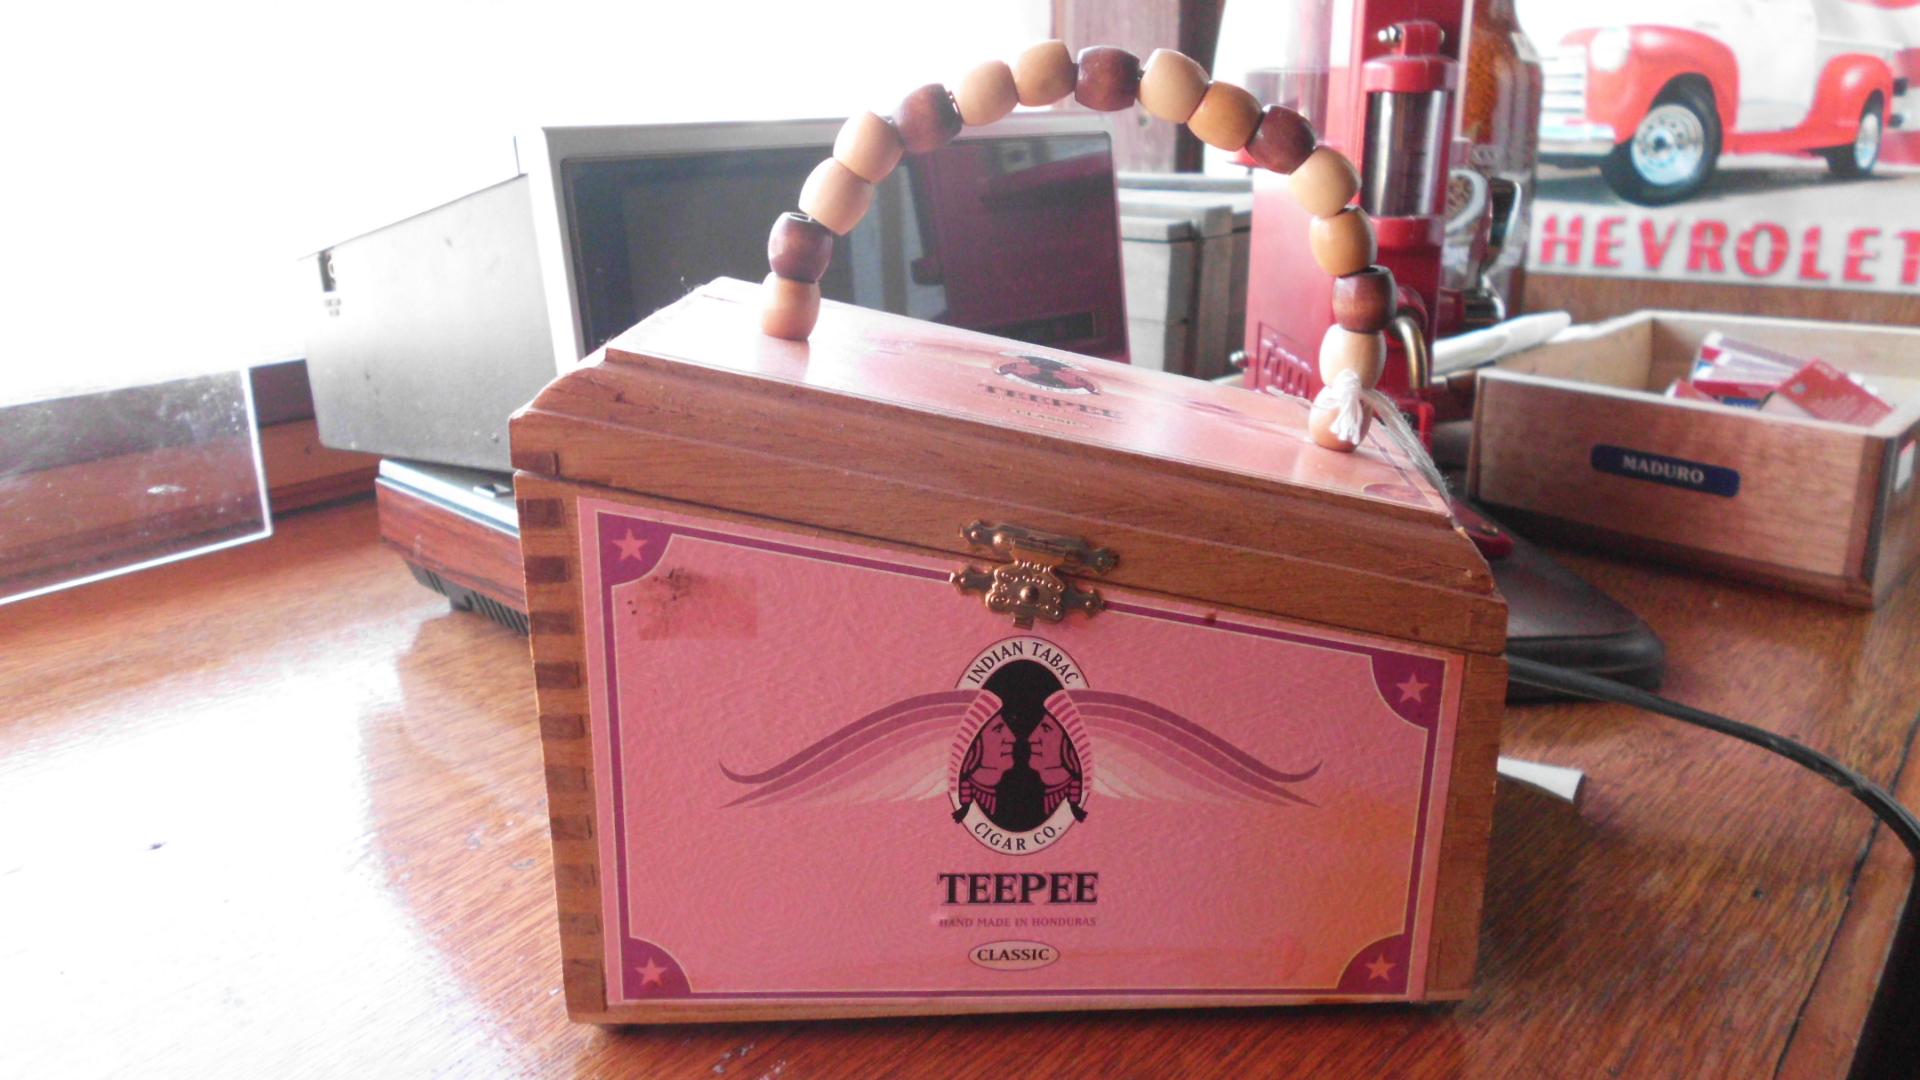 teepee_cigar_box_purse_zebra_lined_purses_and_handbags_4.JPG